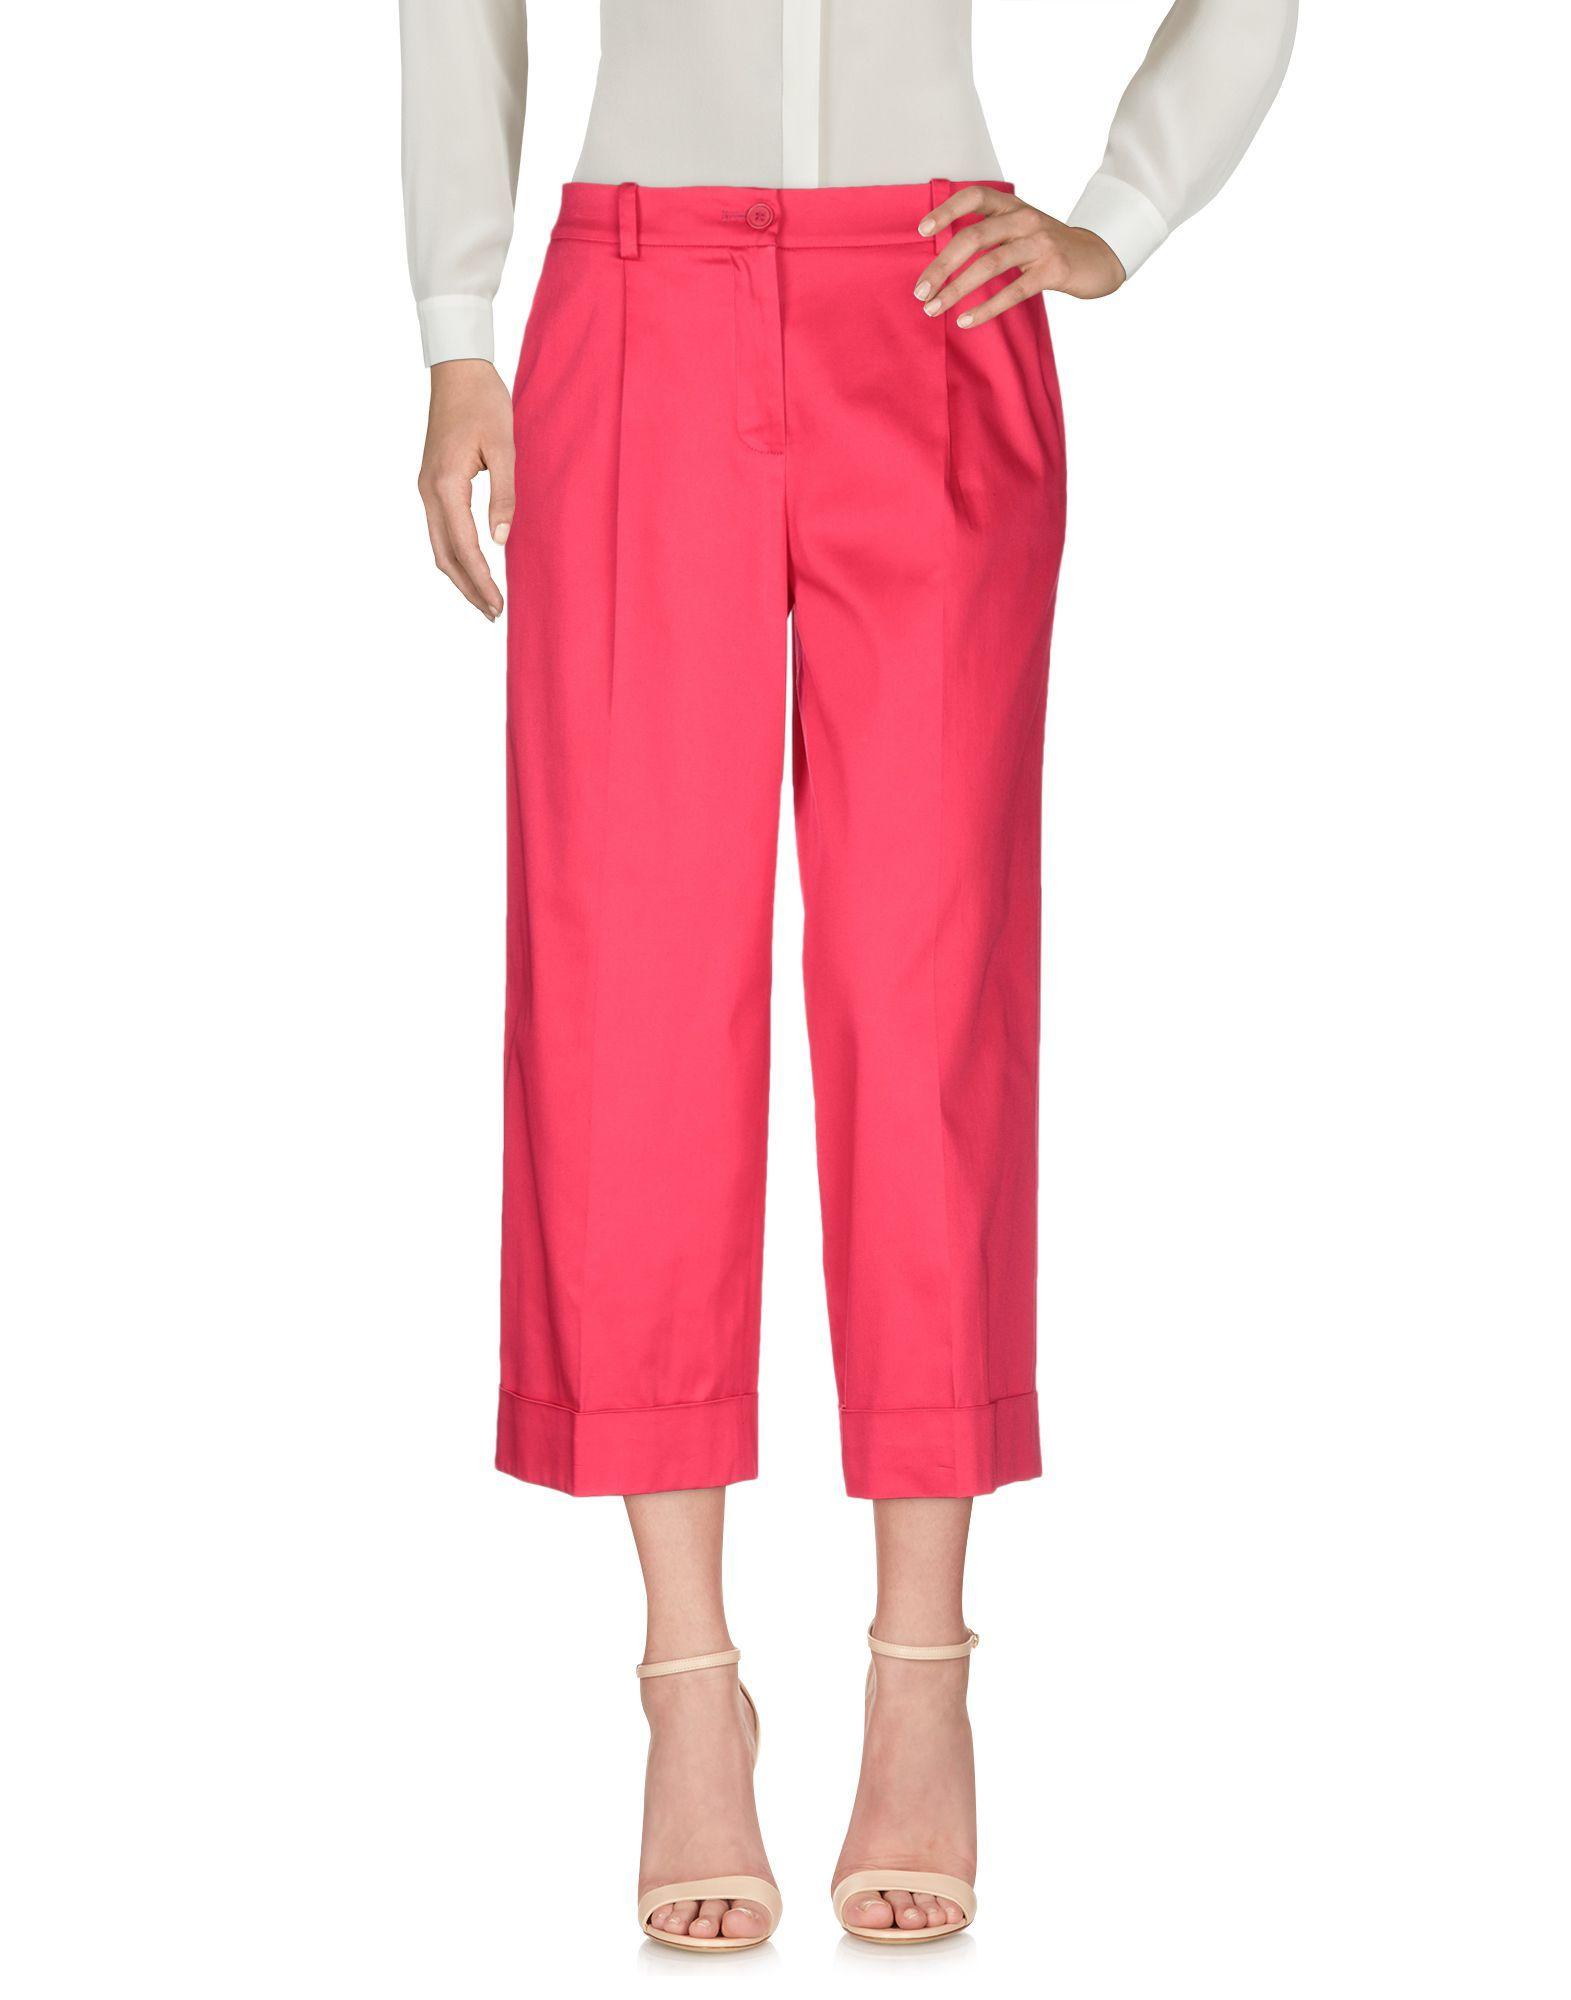 Trousers Women's P.A.R.O.S.H. Fuchsia Cotton